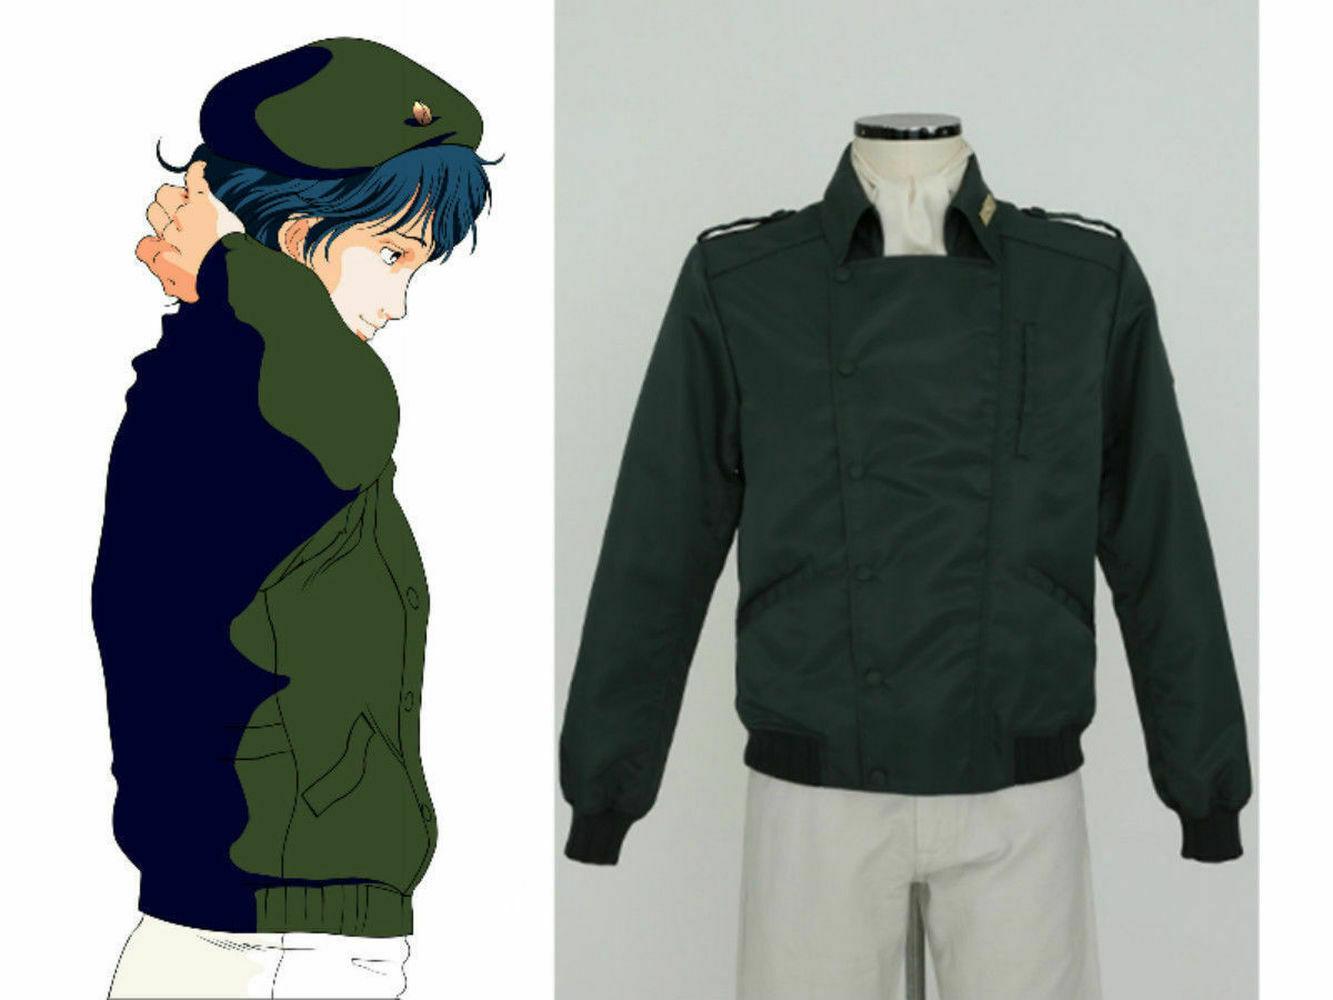 Legend of the Galactic Heroes Yang Wenli Coalition Military uniform Cosplay coat